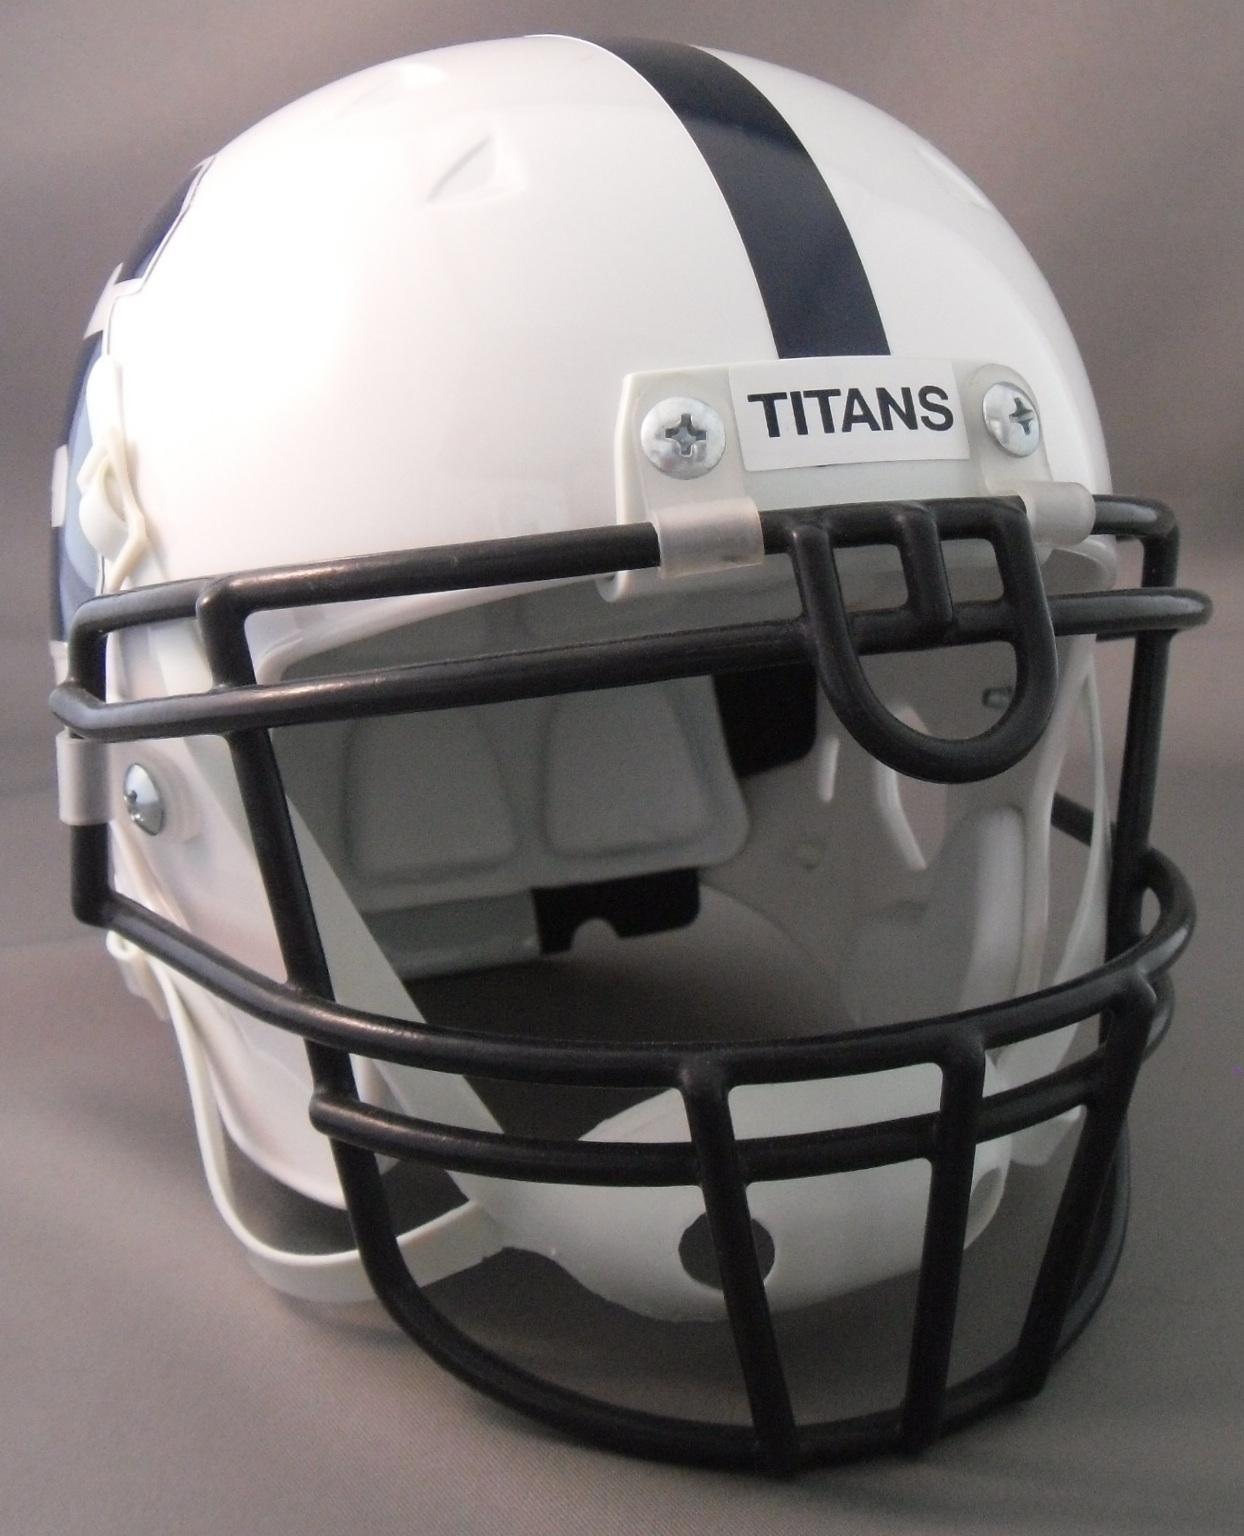 Back Bumper Football Helmets Types : Helmetnation syracuse titans a football in utah